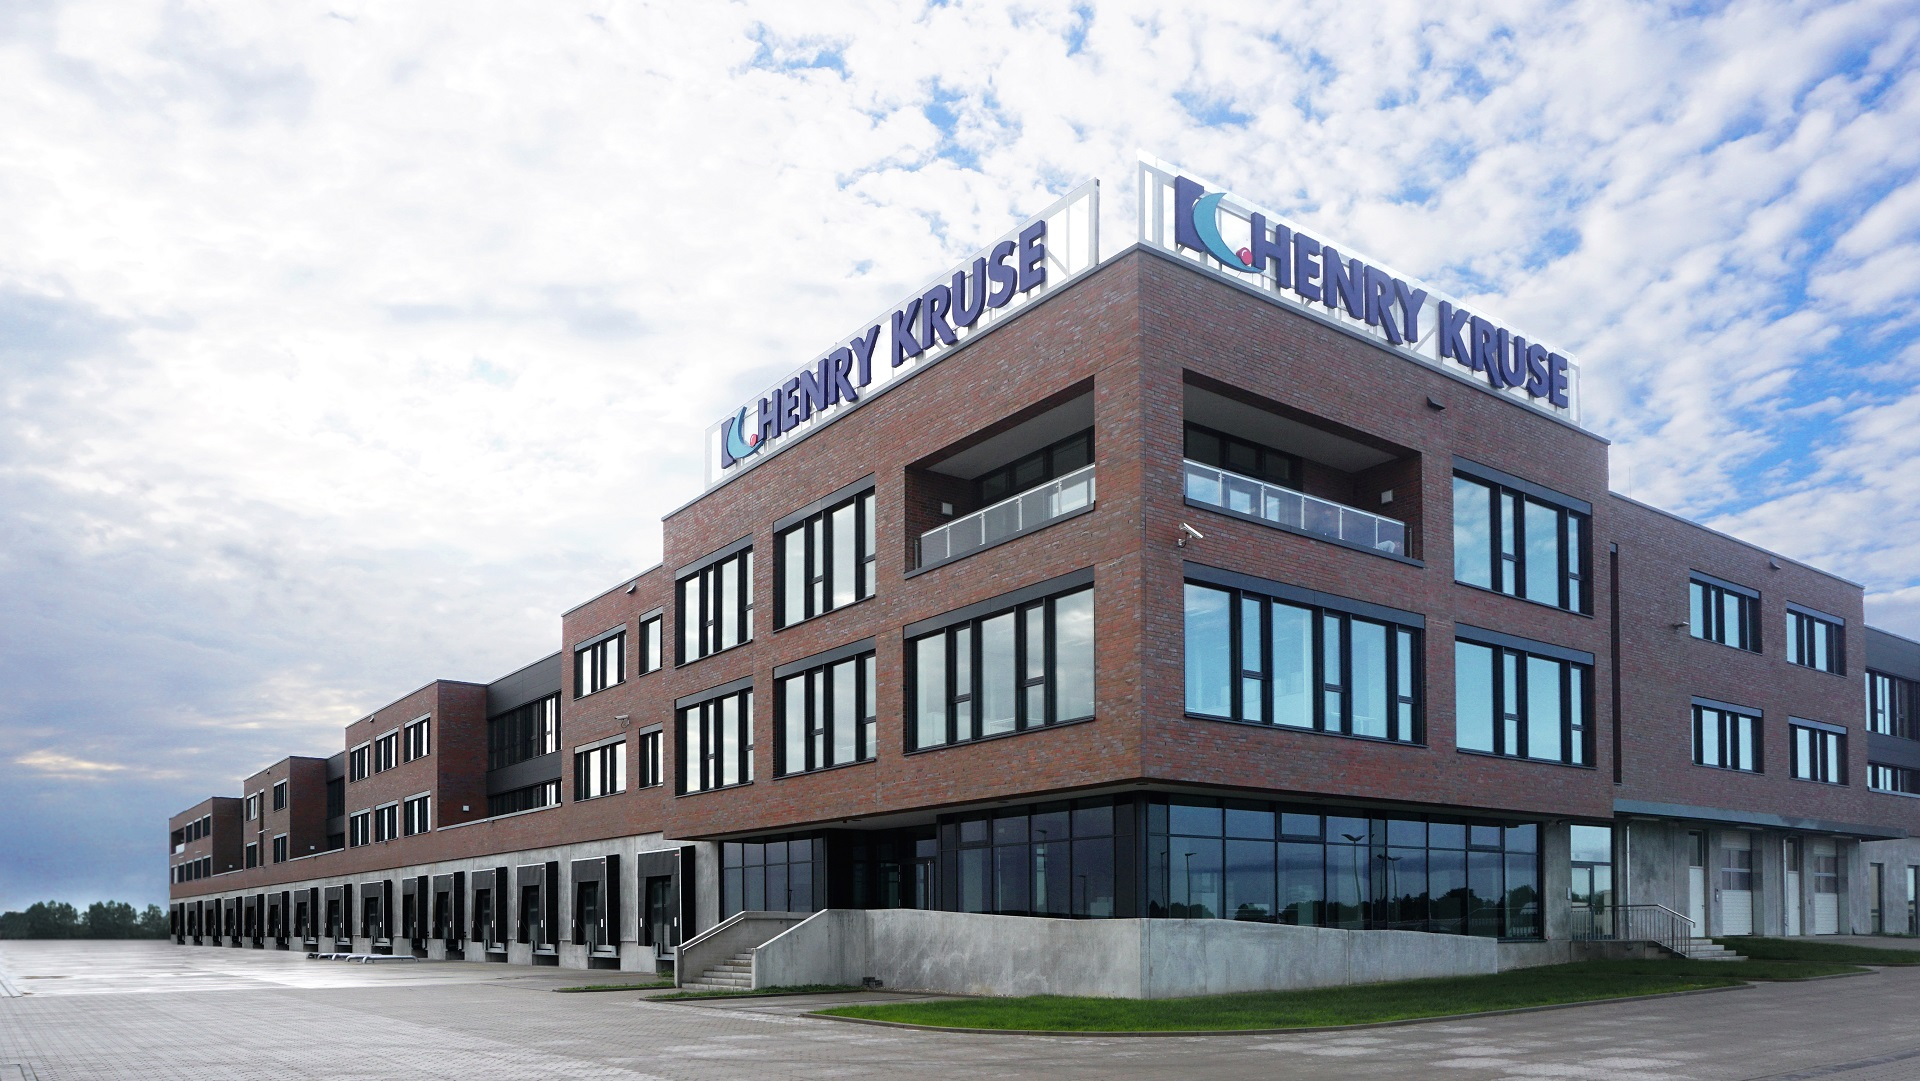 Firmengebäude Kruse Firmenverbund Neumünster